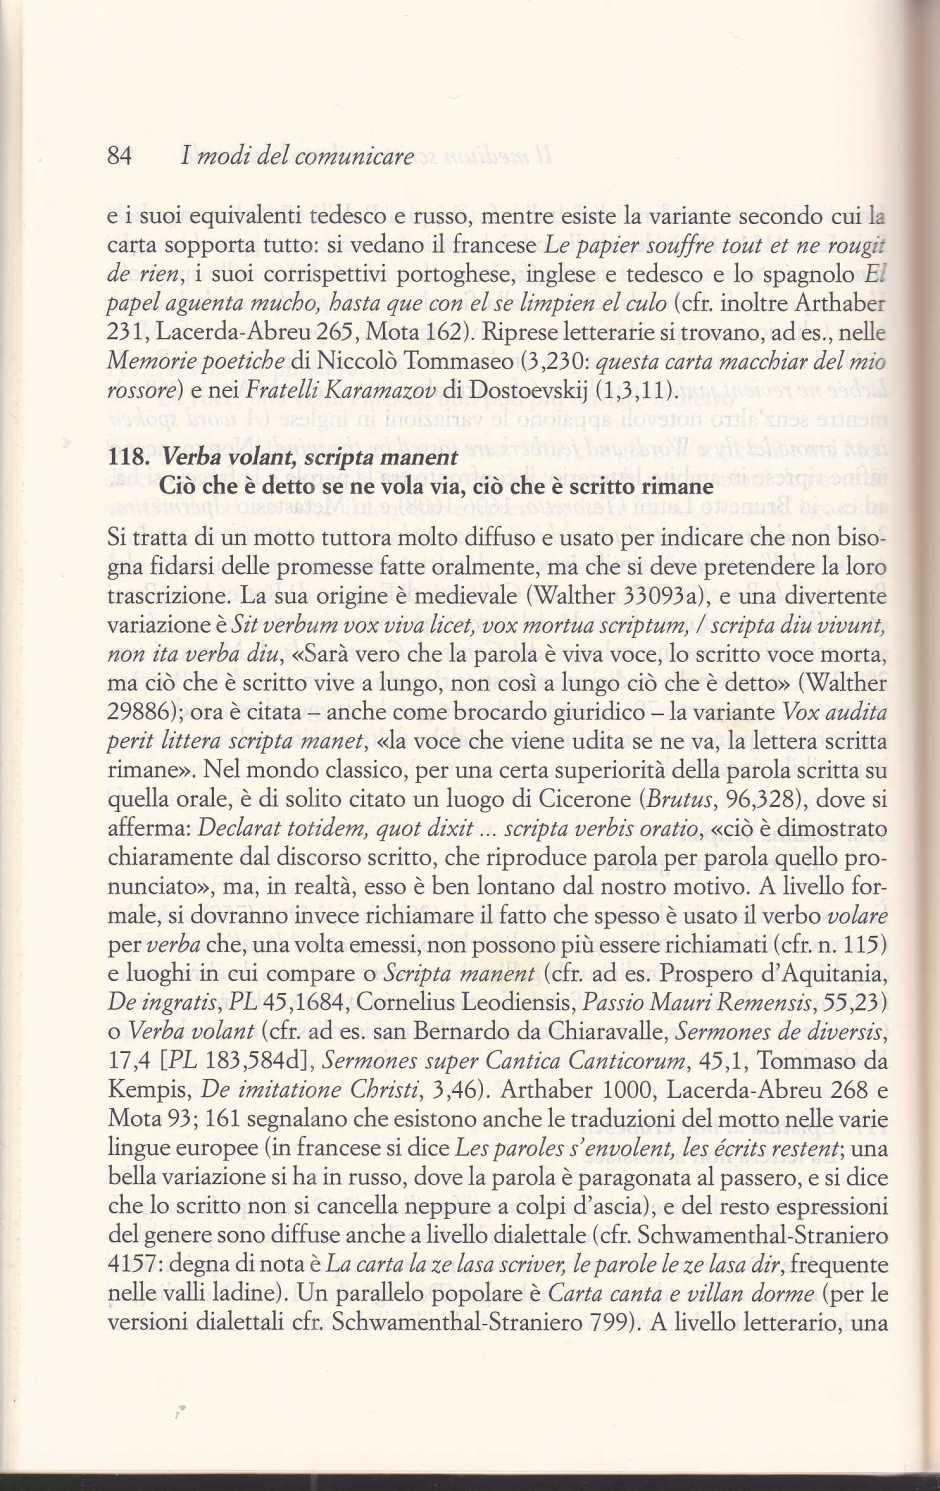 verba volant2575